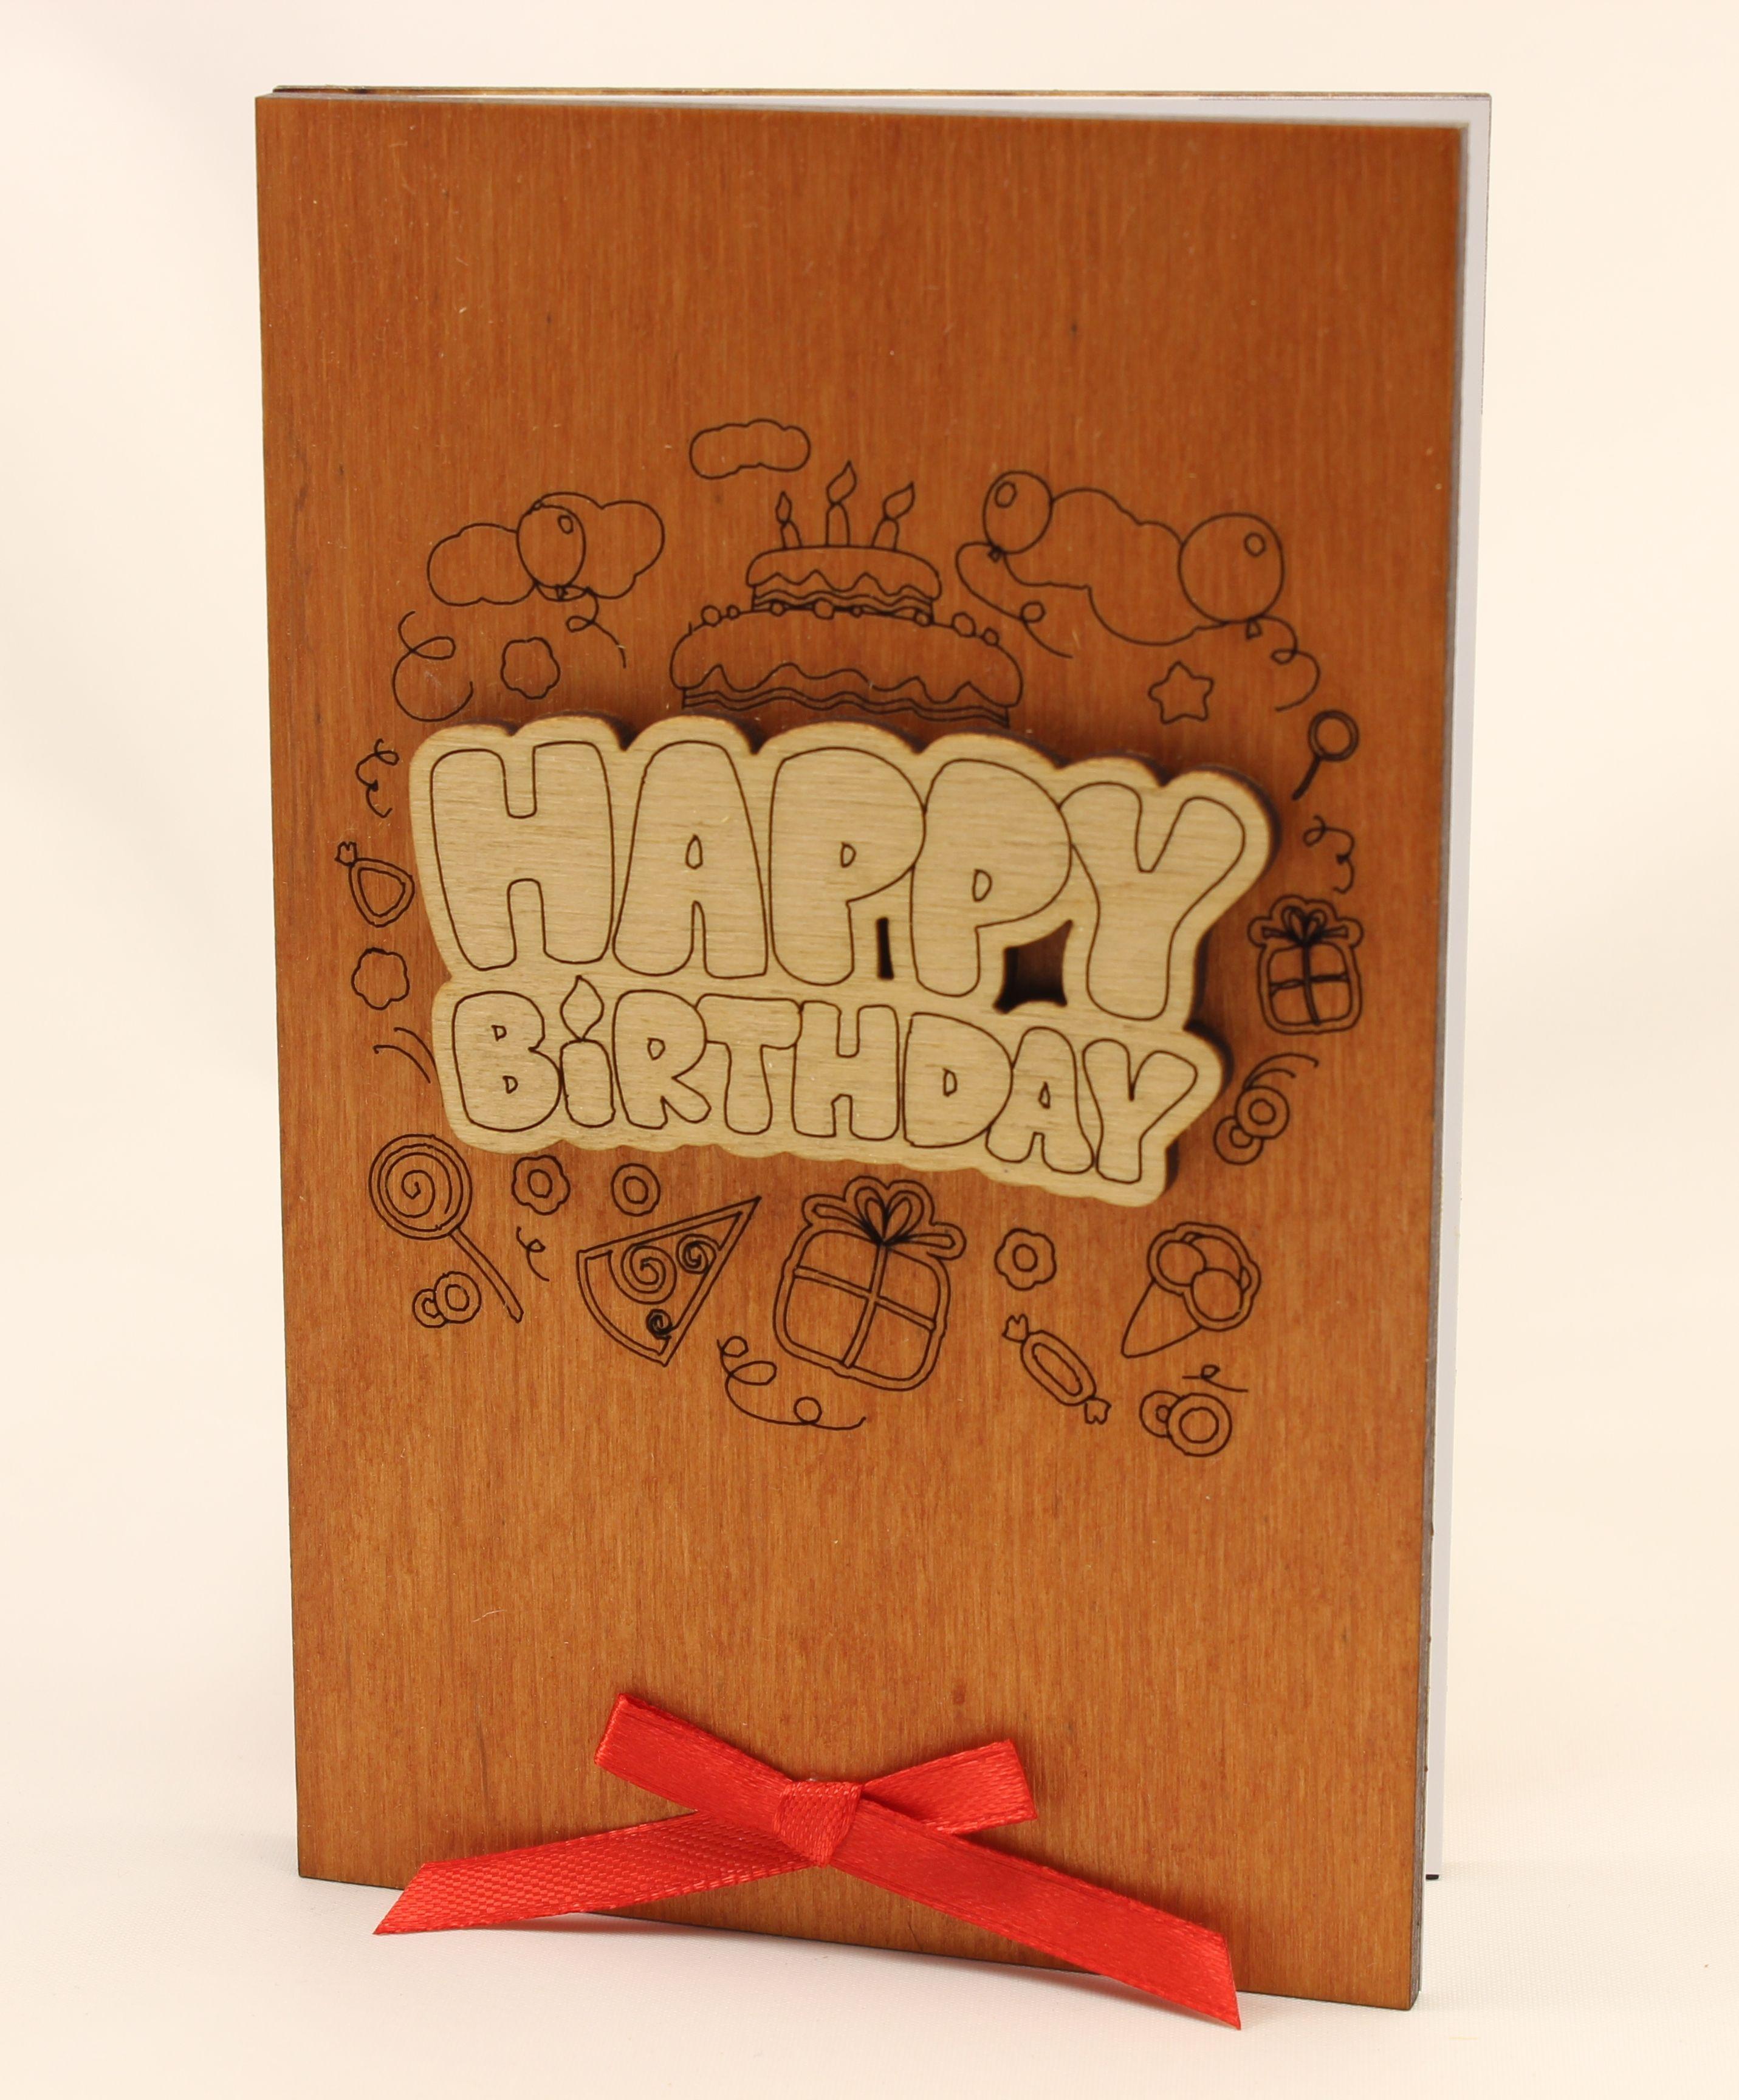 Handmade Happy Birthday Card Original Gift For Him Husband Man Her Wife Woman On ETSY